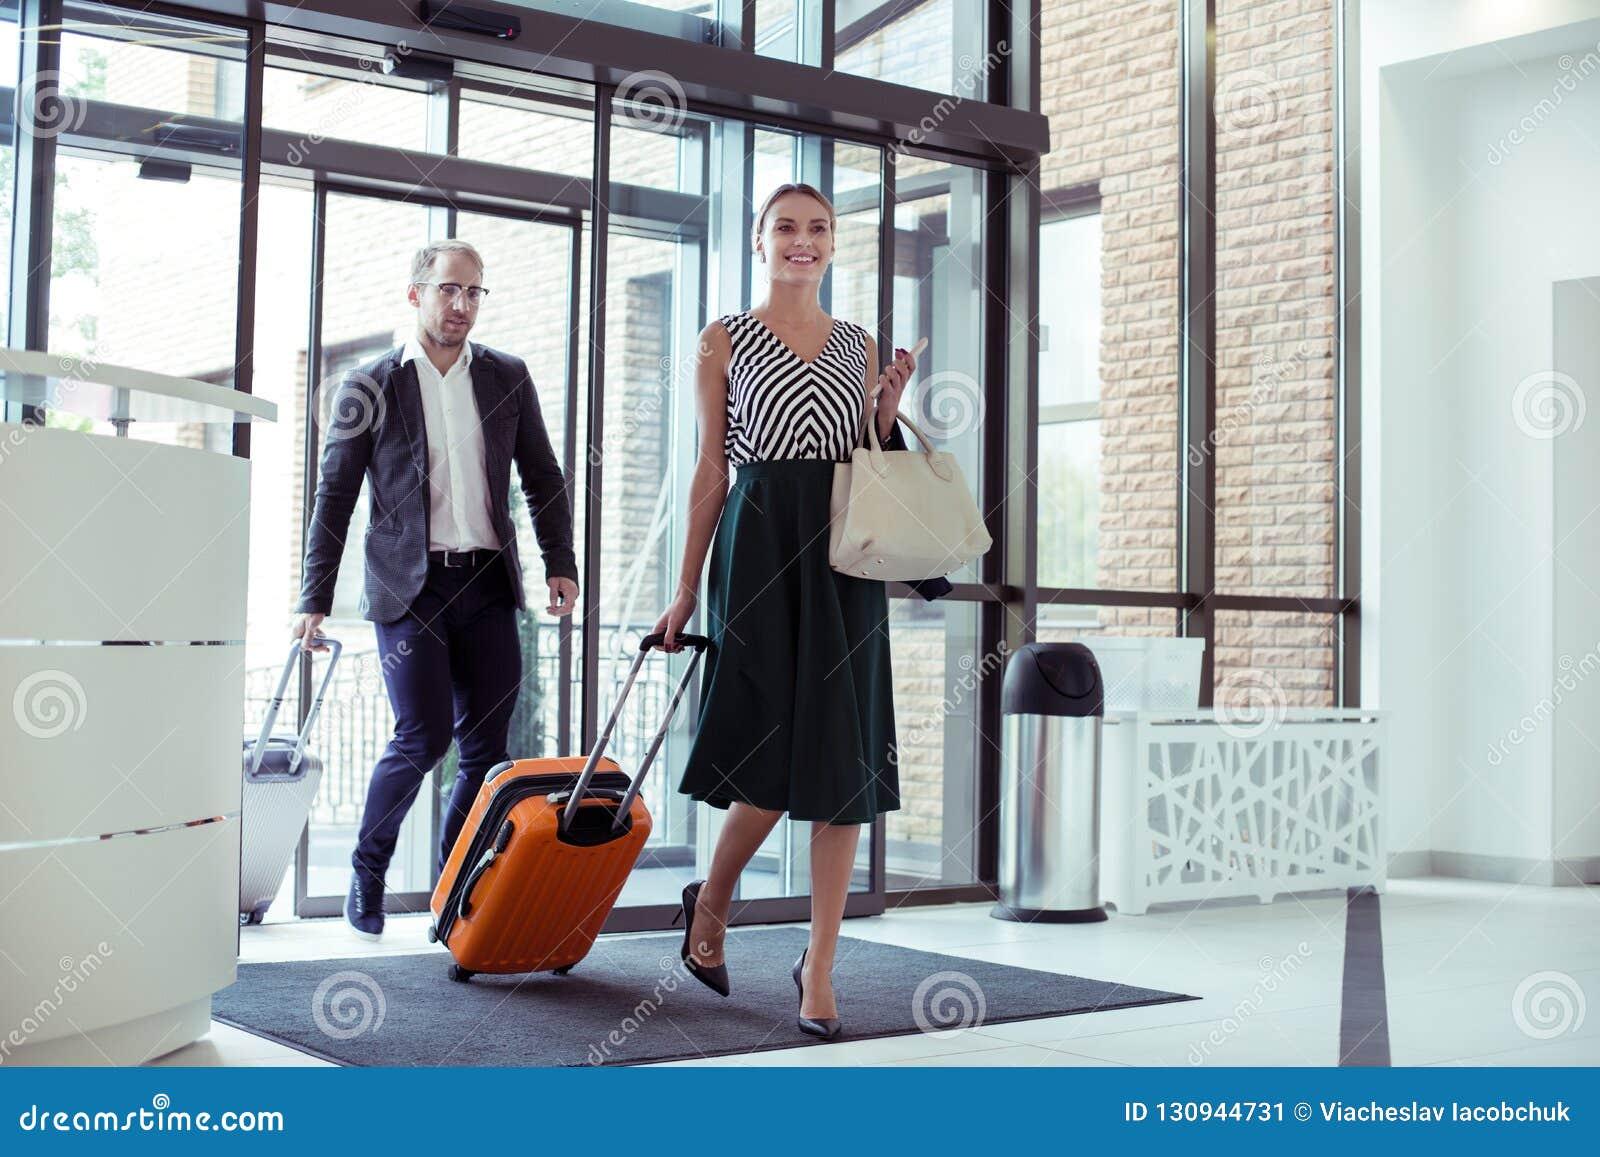 Beautiful wife accompanying her successful husband on business trip